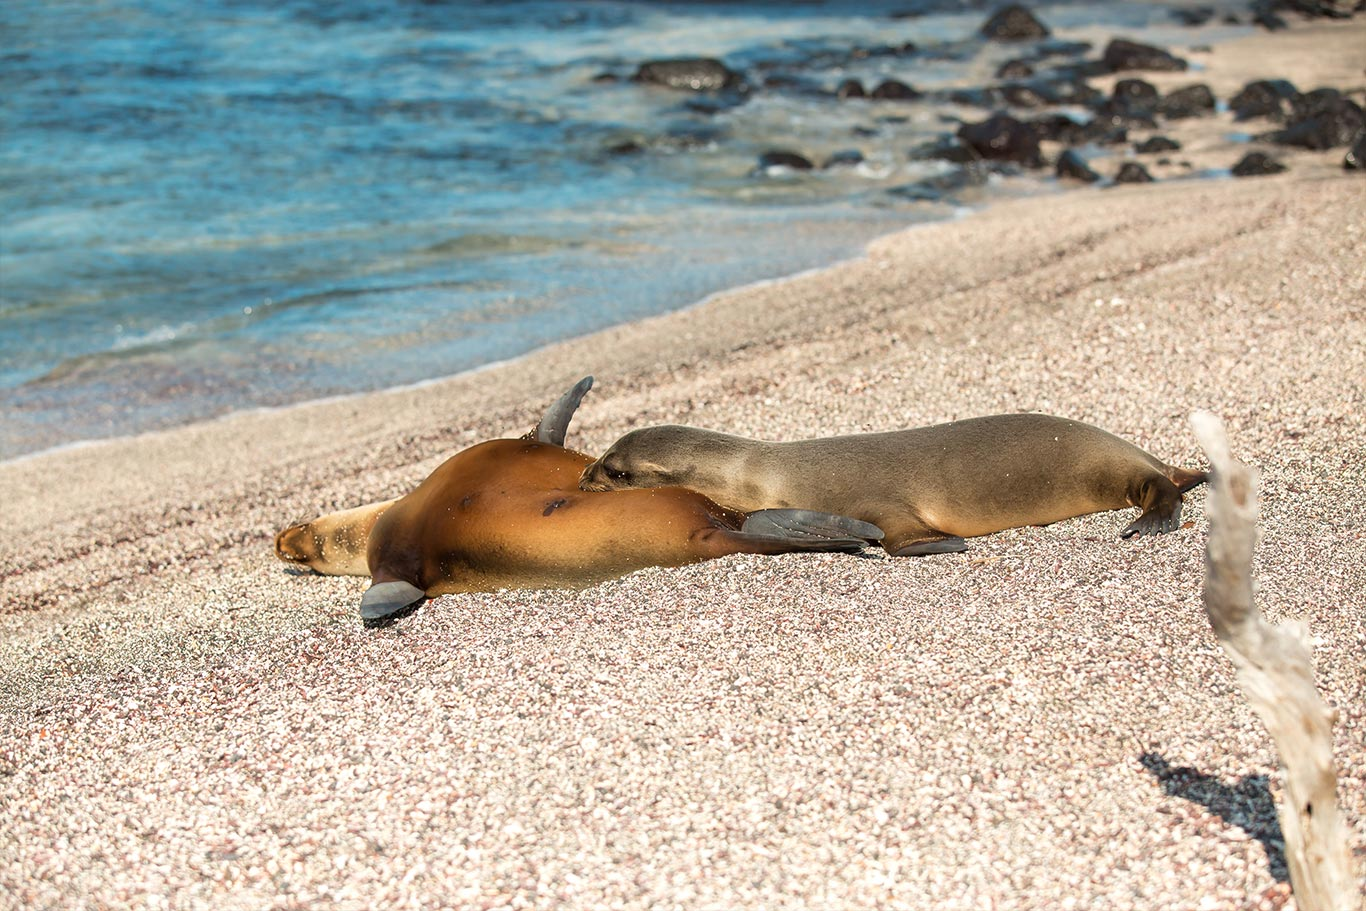 Galapagos-(15)-1366